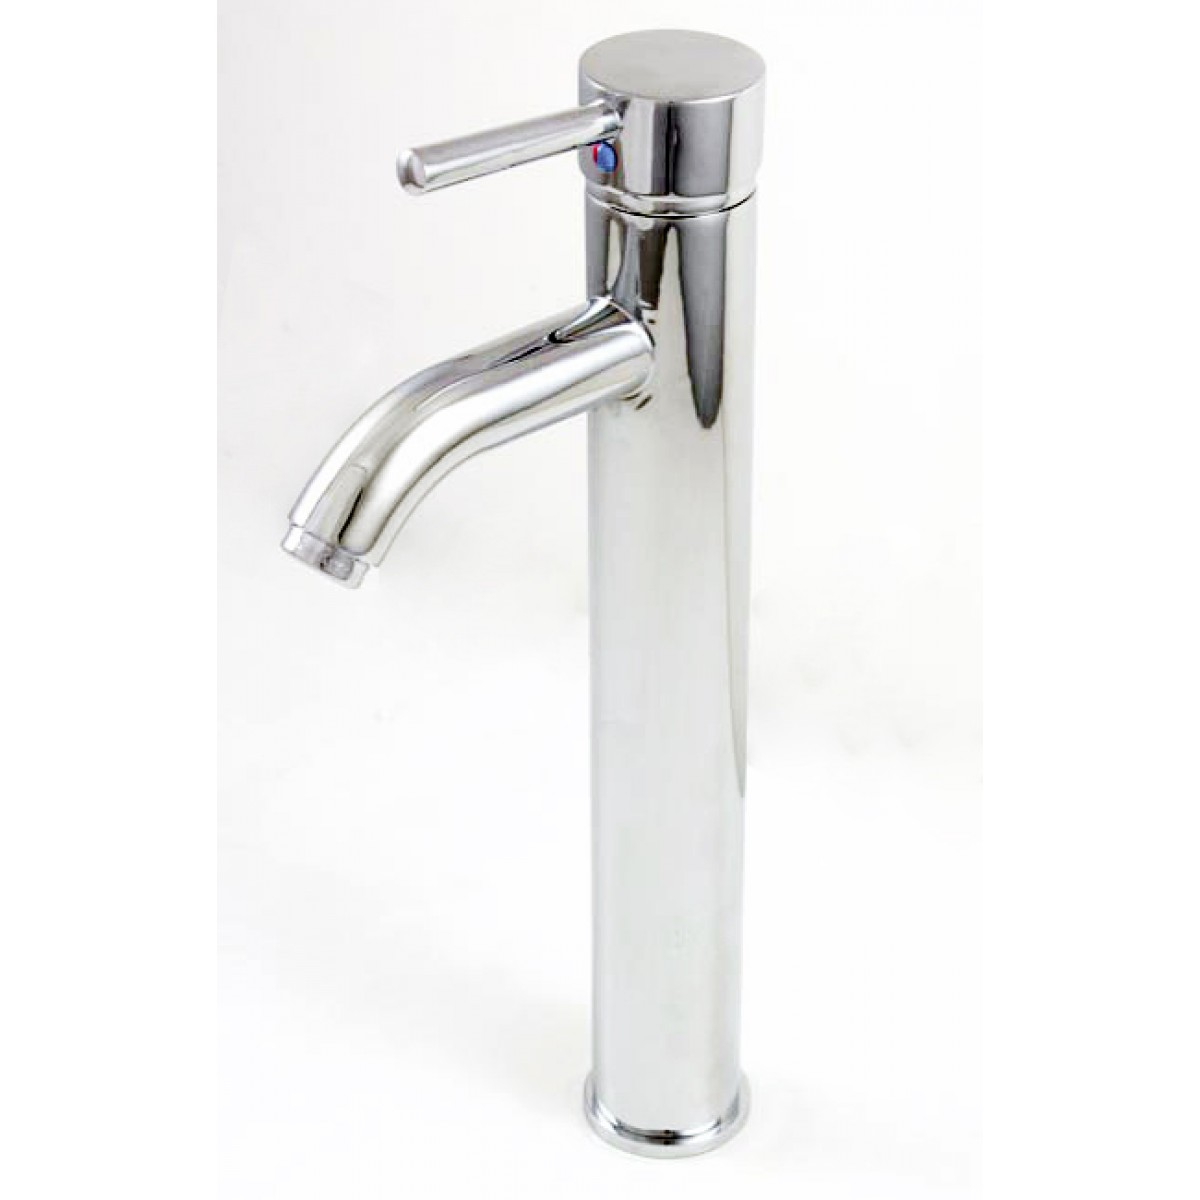 European Style Polished Chrome Bathroom Lavatory Vessel Sink Faucet ...